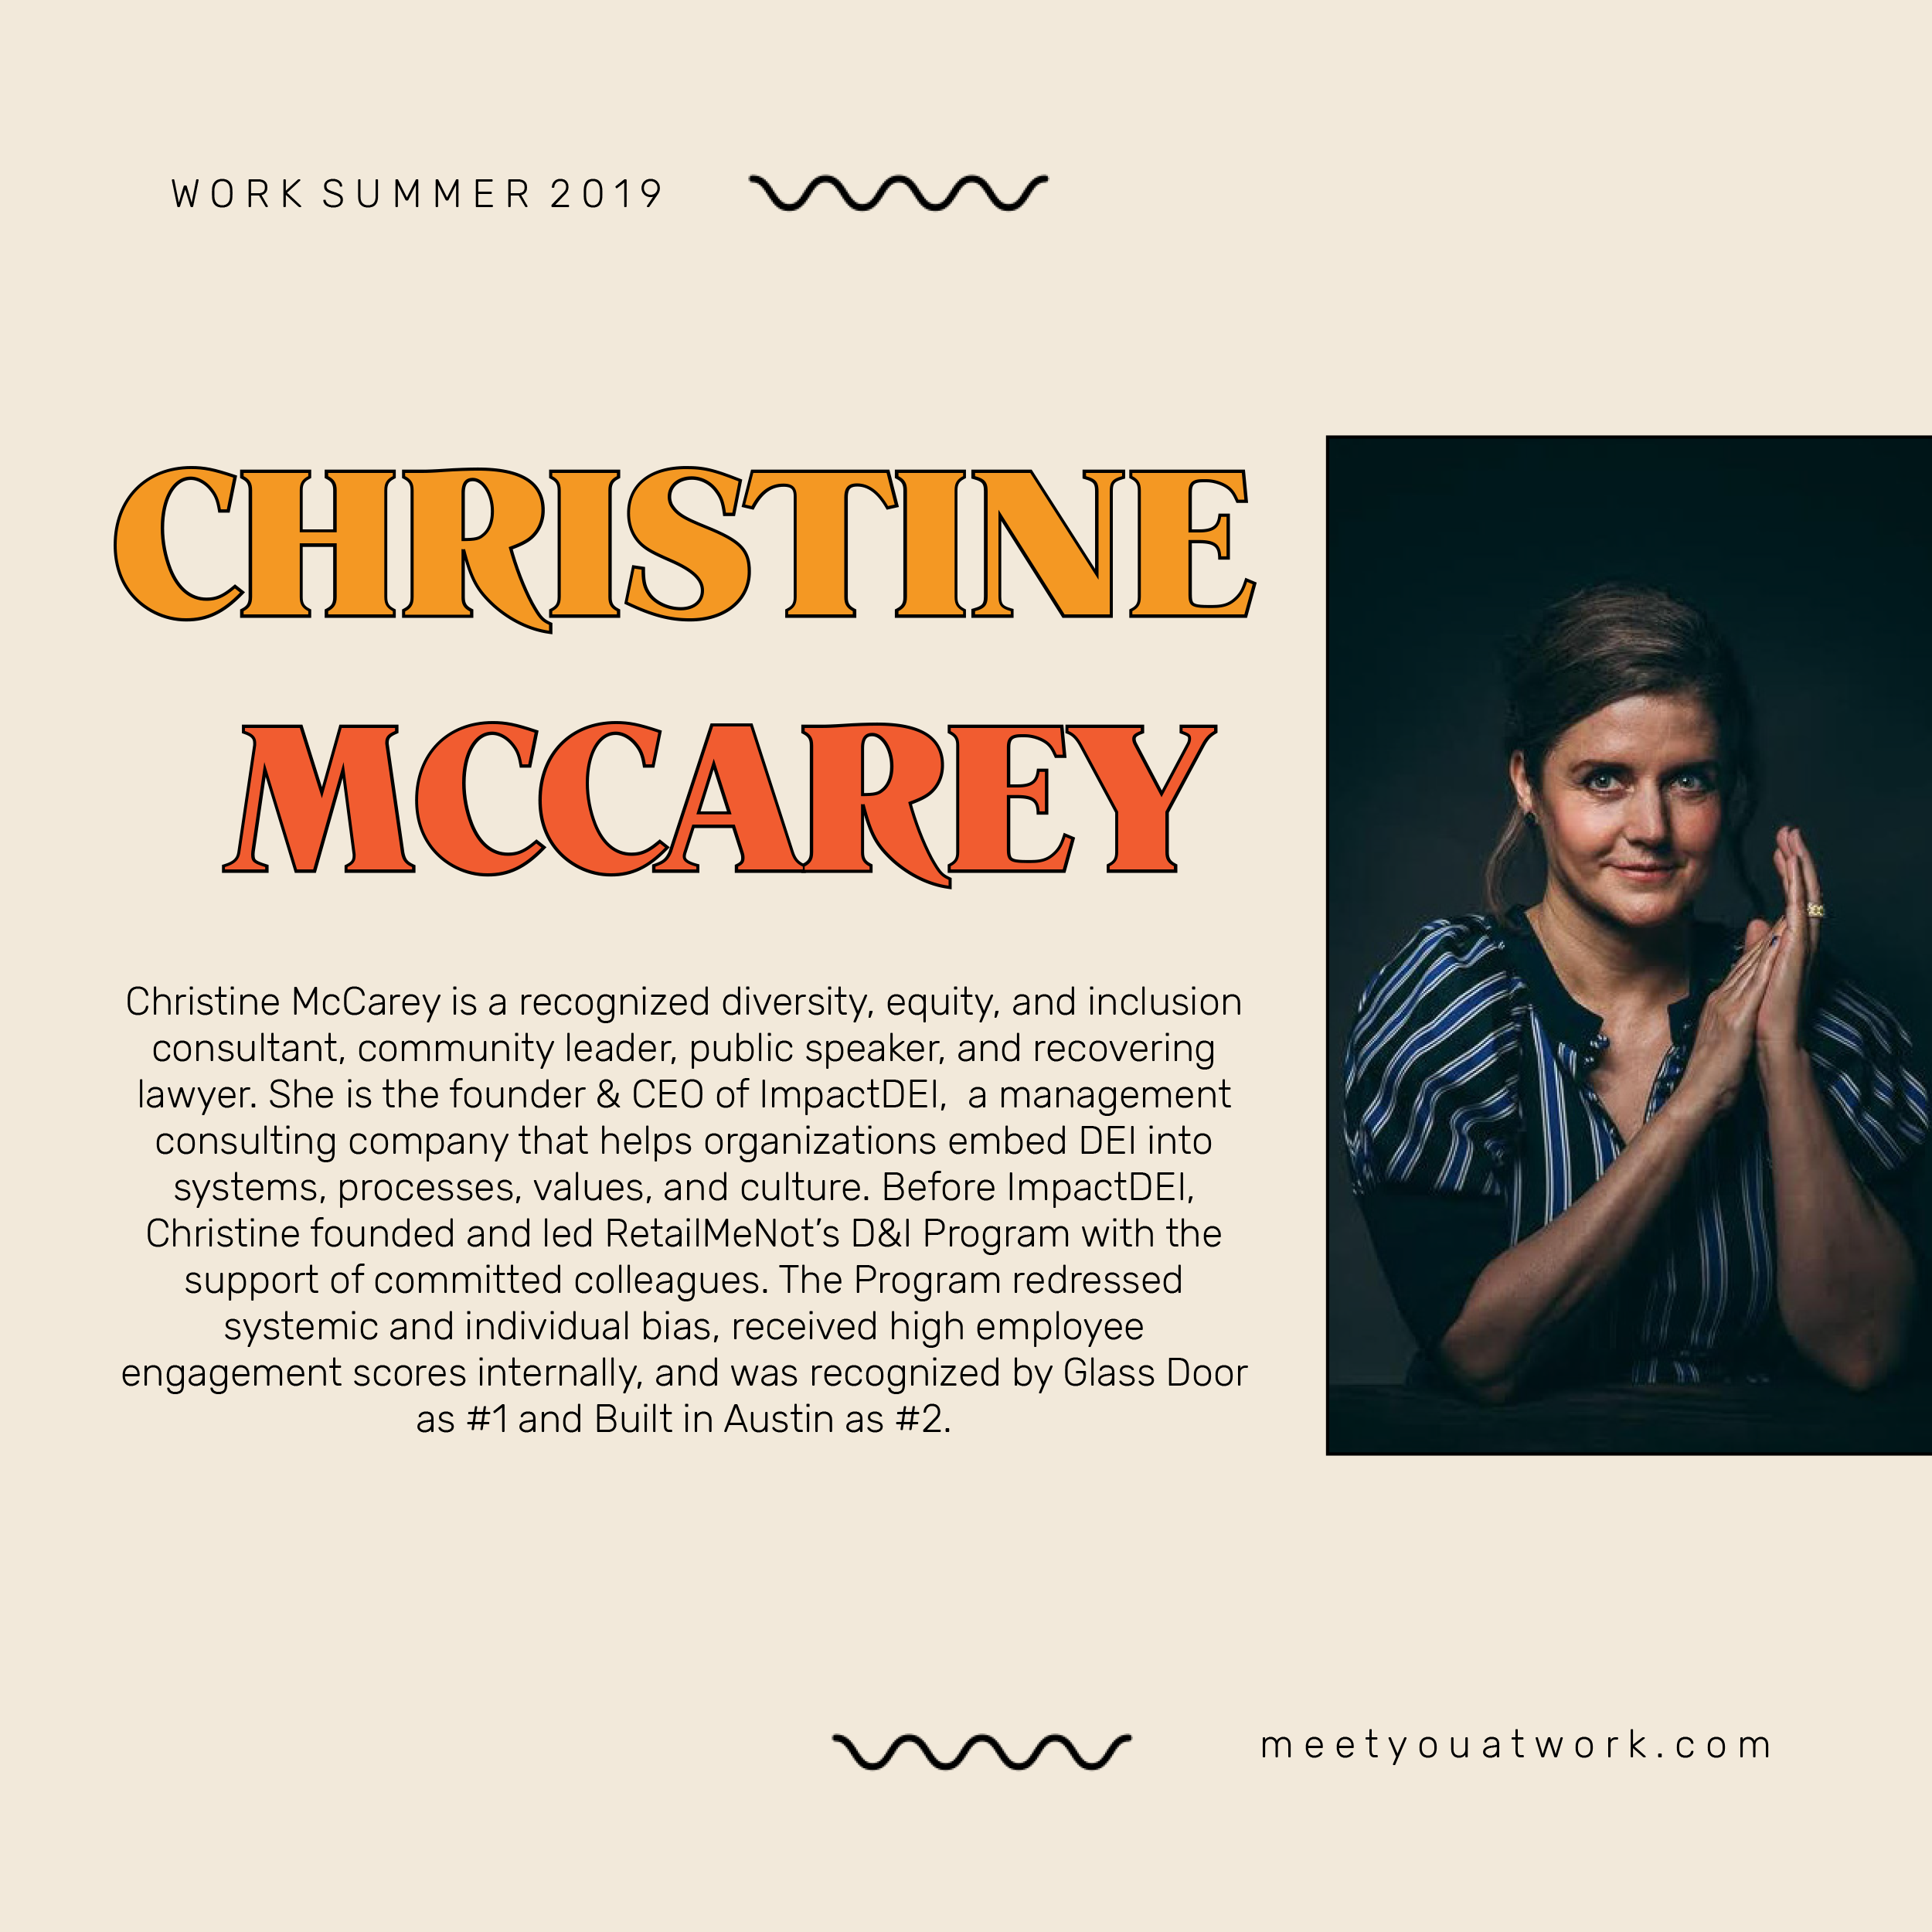 CHRISTINEMCCAREY_work2019.png